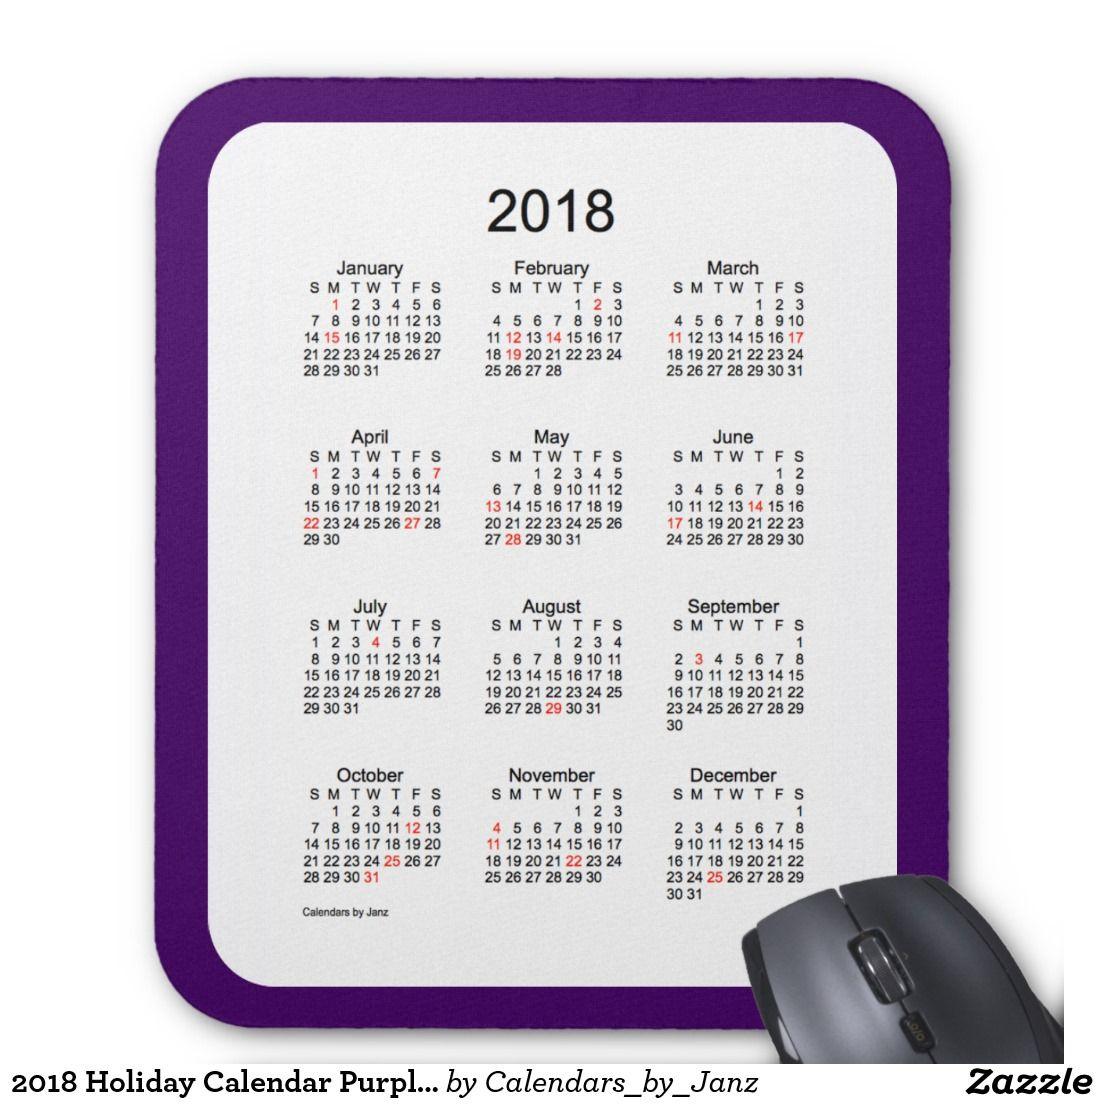 2018 Holiday Calendar Purple Mouse Pad